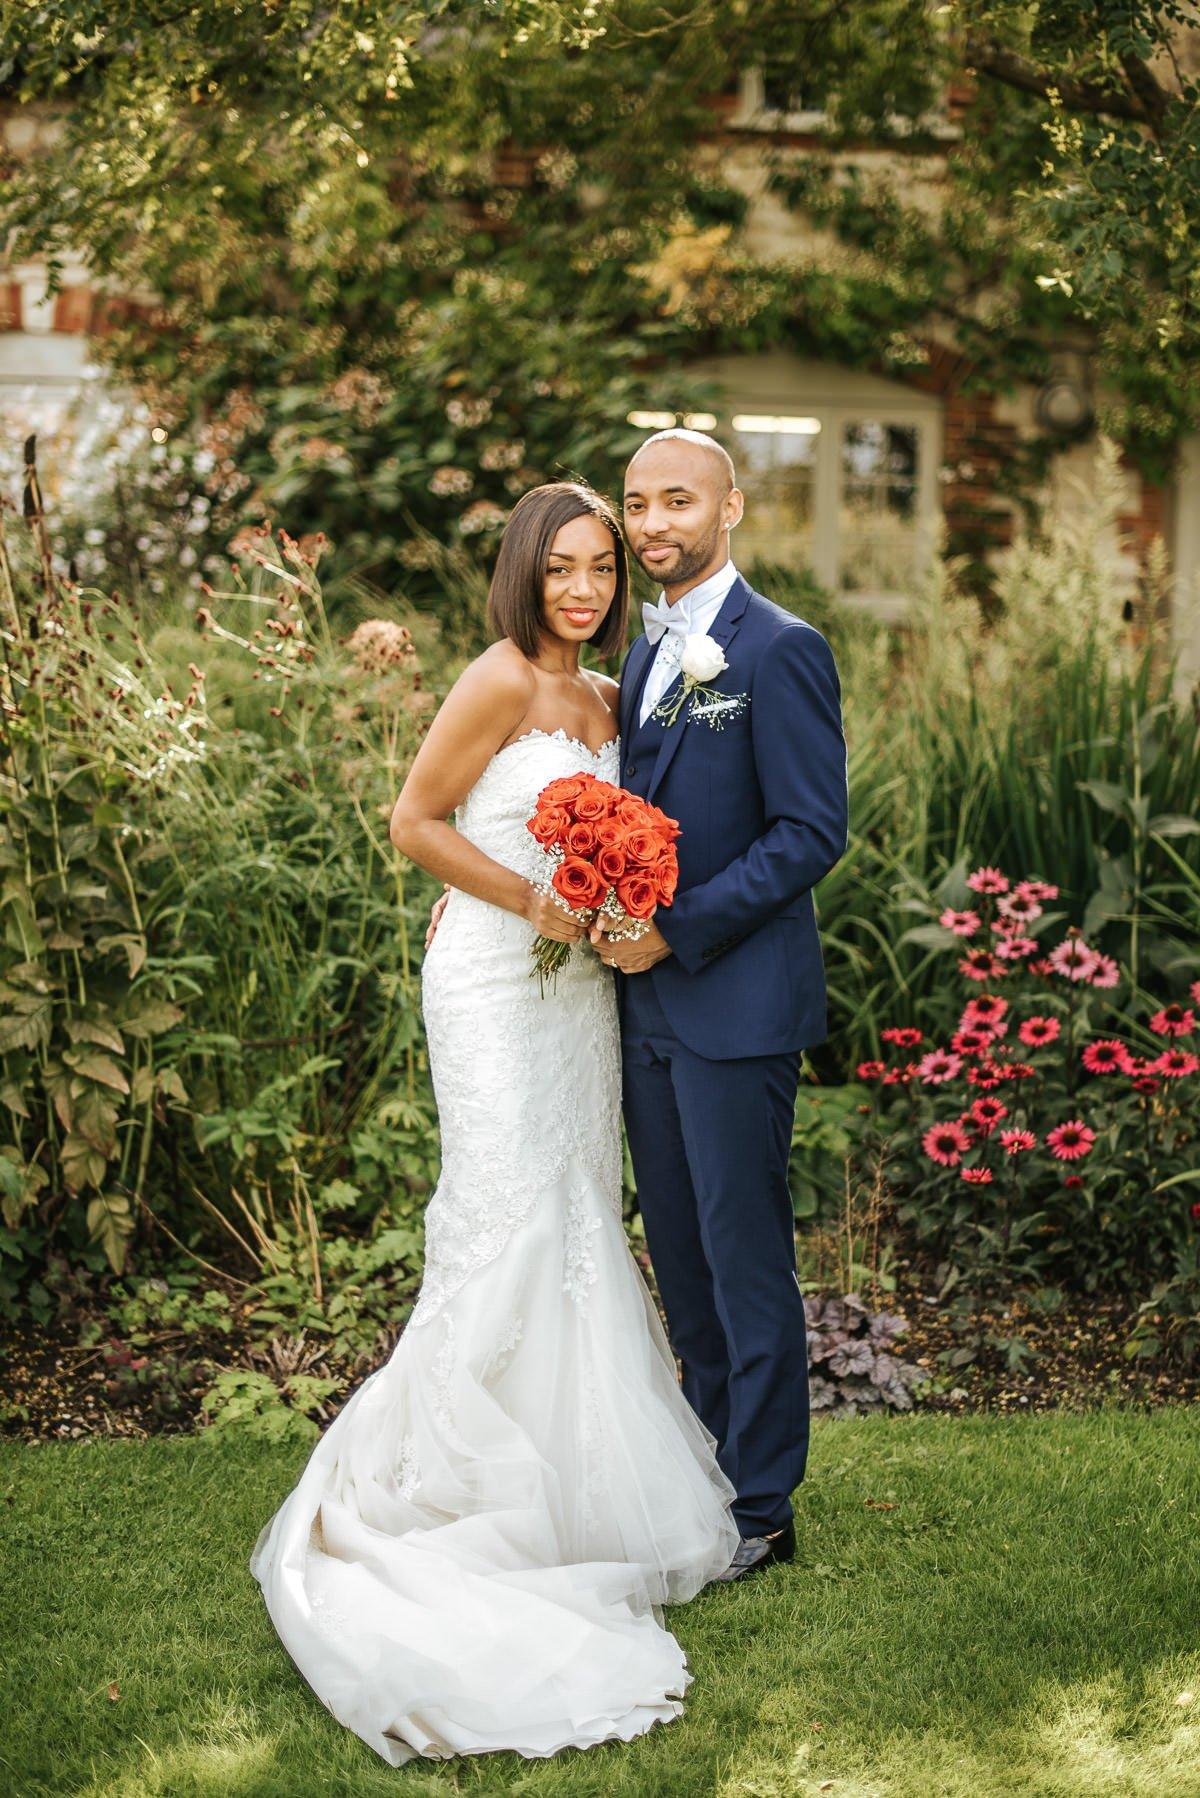 Bury Court Barn - Wedding Photographer Hampshire 54